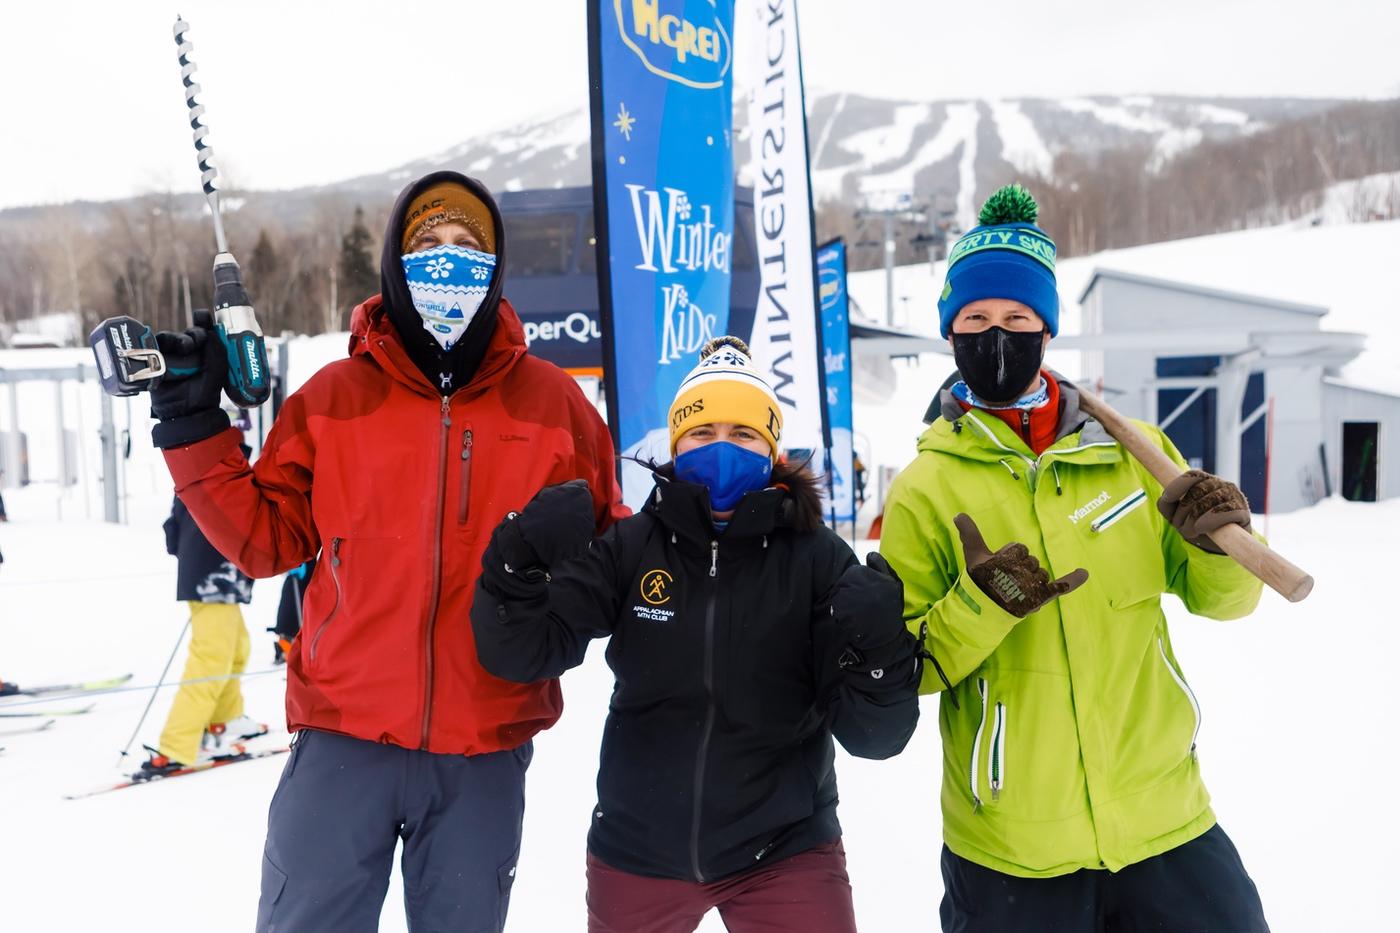 WinterKids Downhill 24 2021 SDP 2740